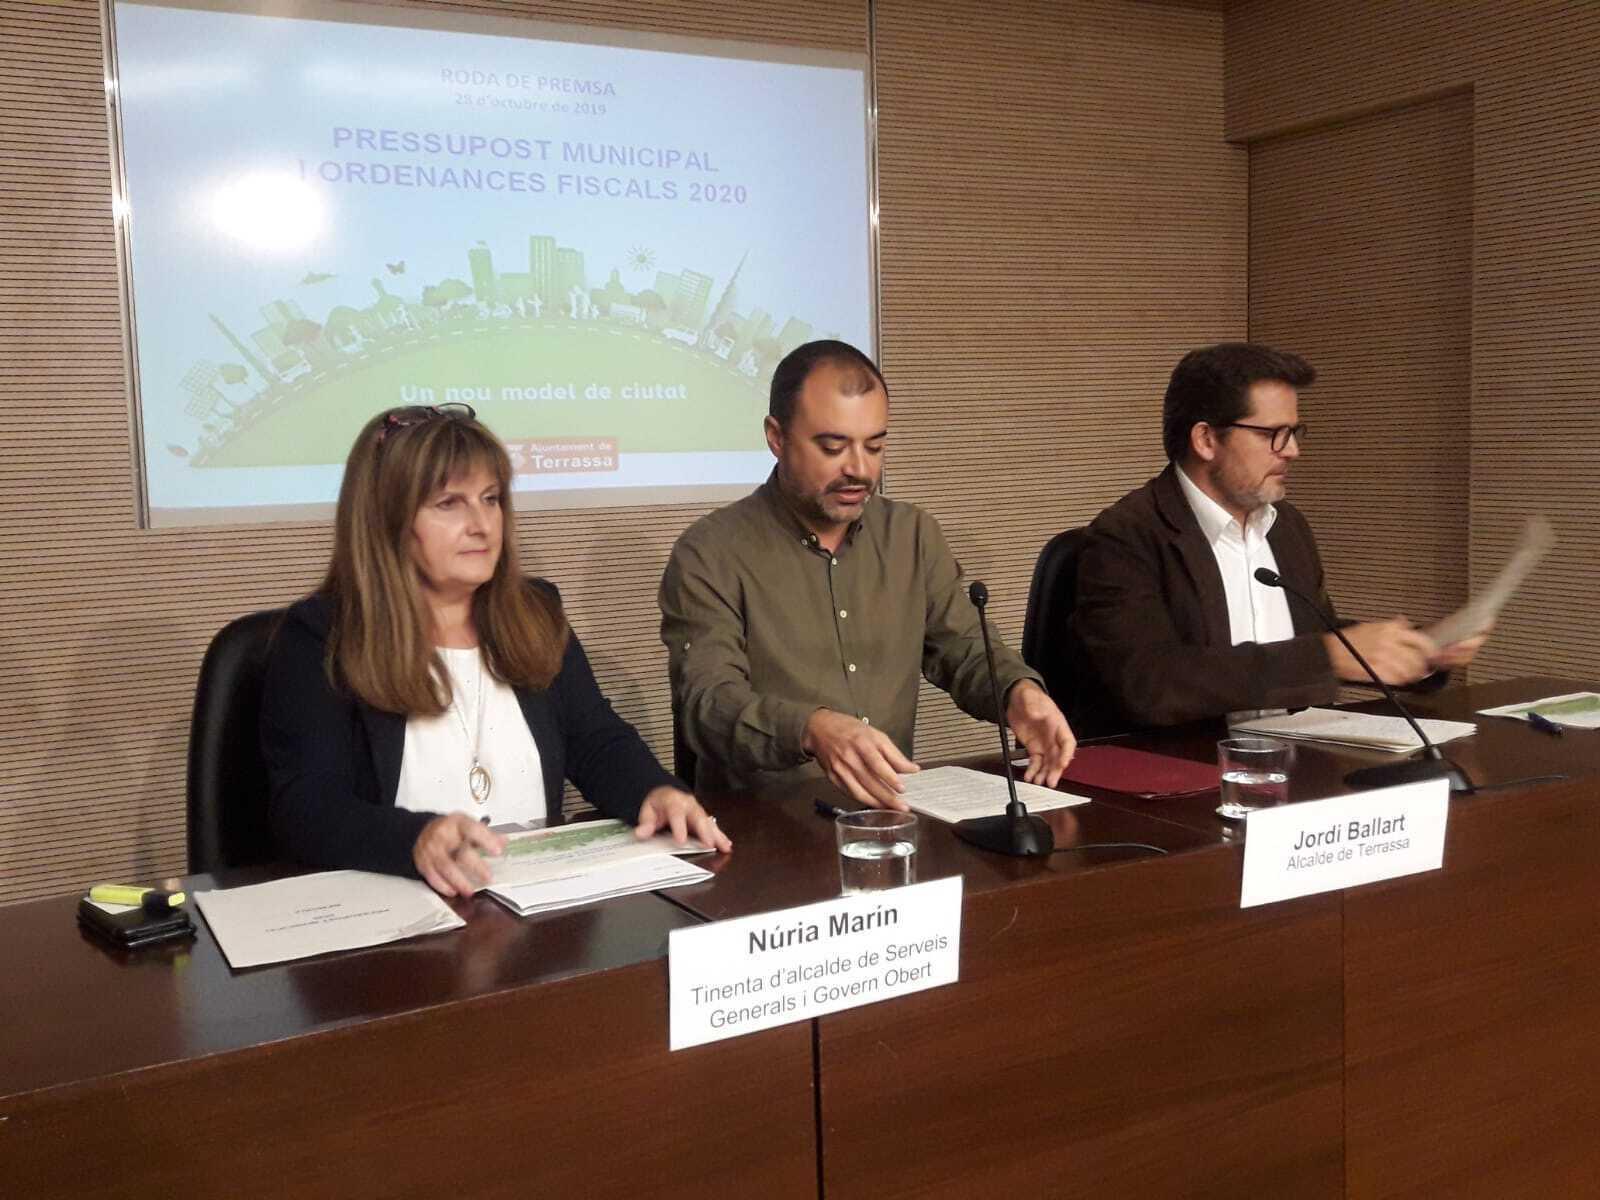 Núria Marín, Jordi Ballart, Isaac Albert